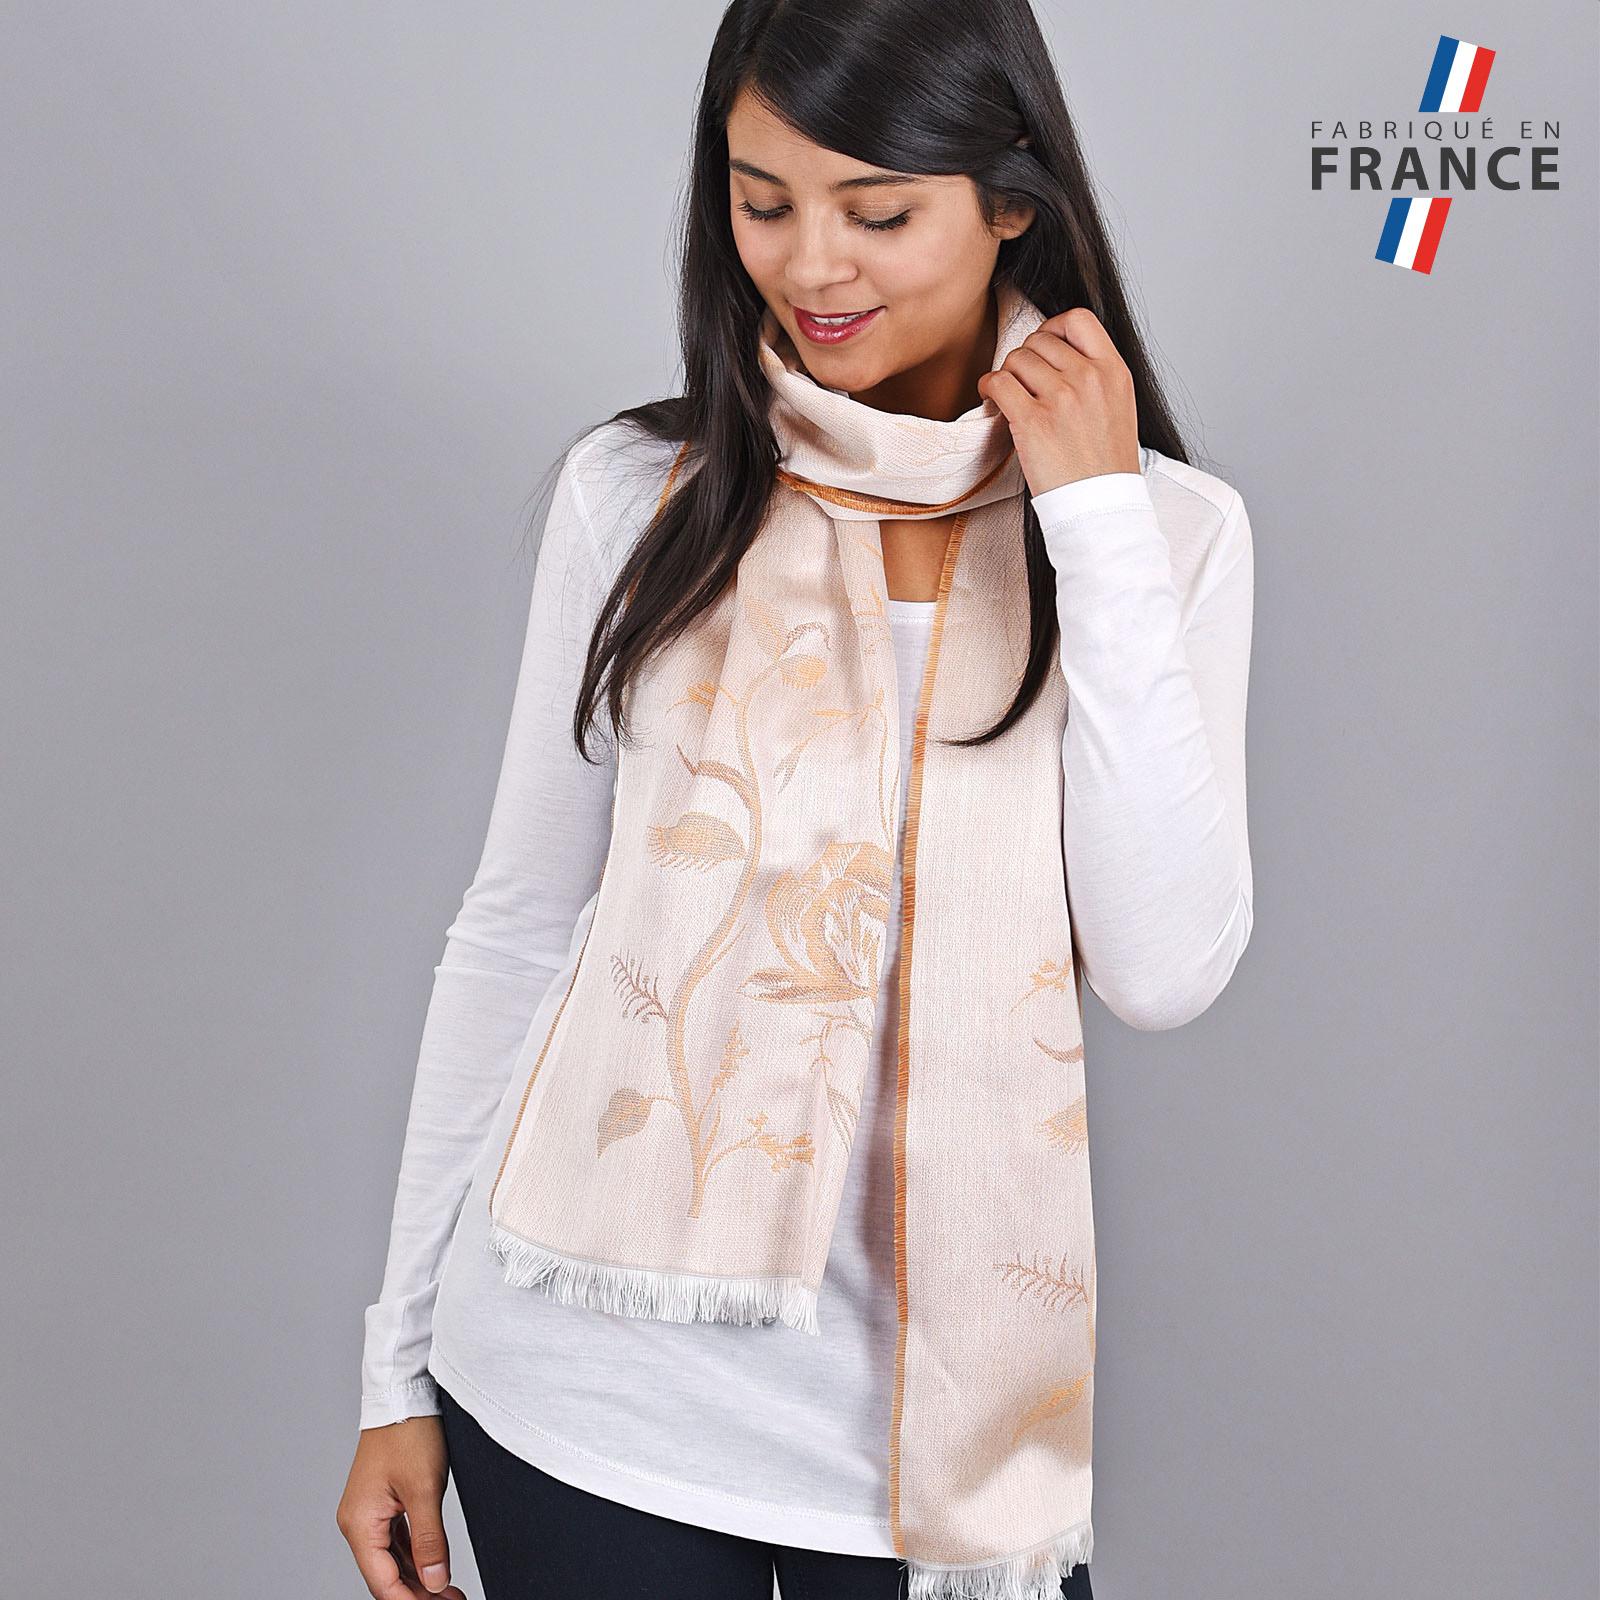 AT-04188-VF16-LB_FR-echarpe-femme-orange-qualicoq-fabrique-france